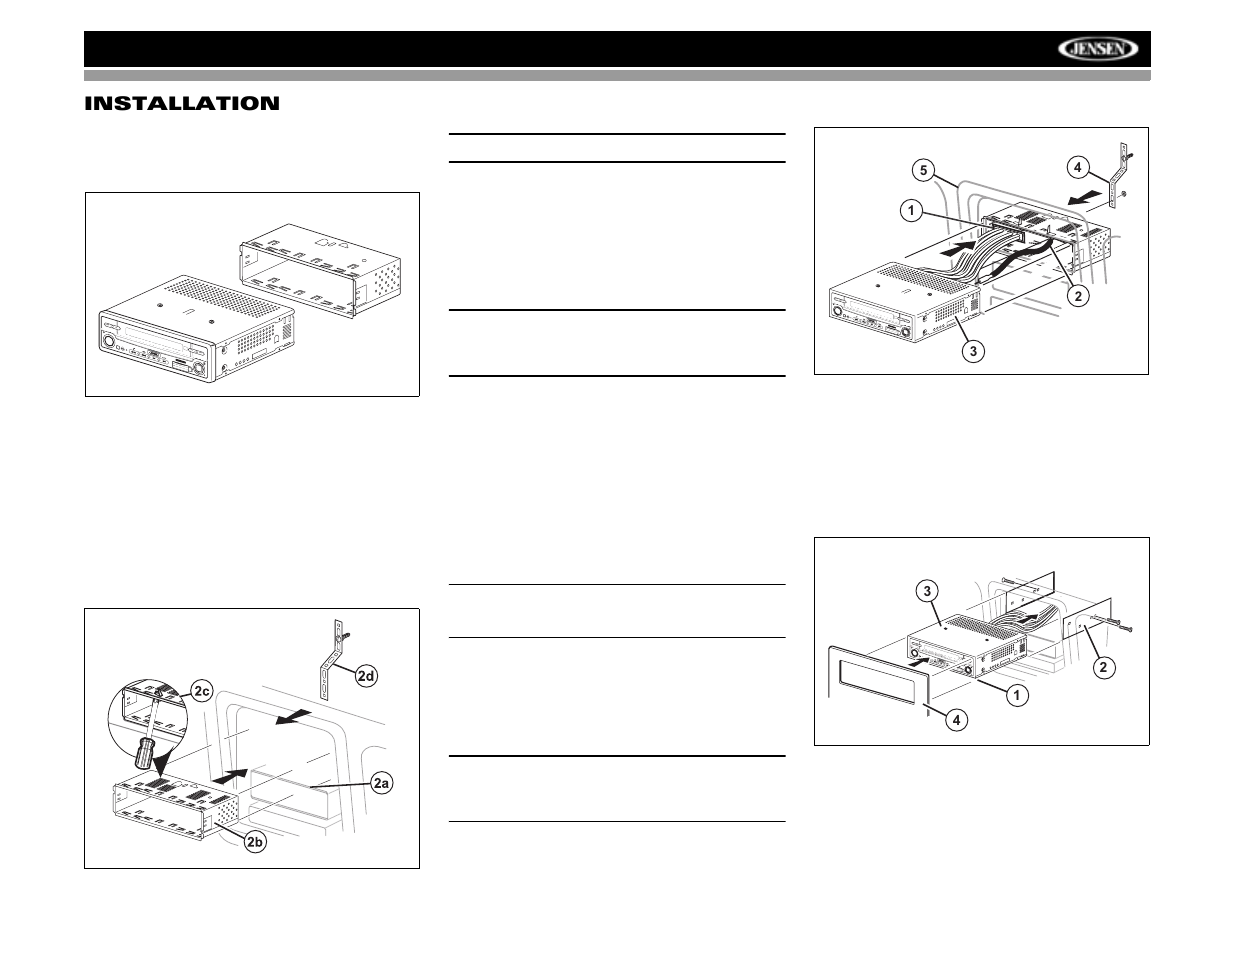 Jensen Vm9512 Wiring Diagram Detailed Schematics Power Acoustik Pd 710 Wire User Manual Page 9 44 Original Mode Tiger Truck